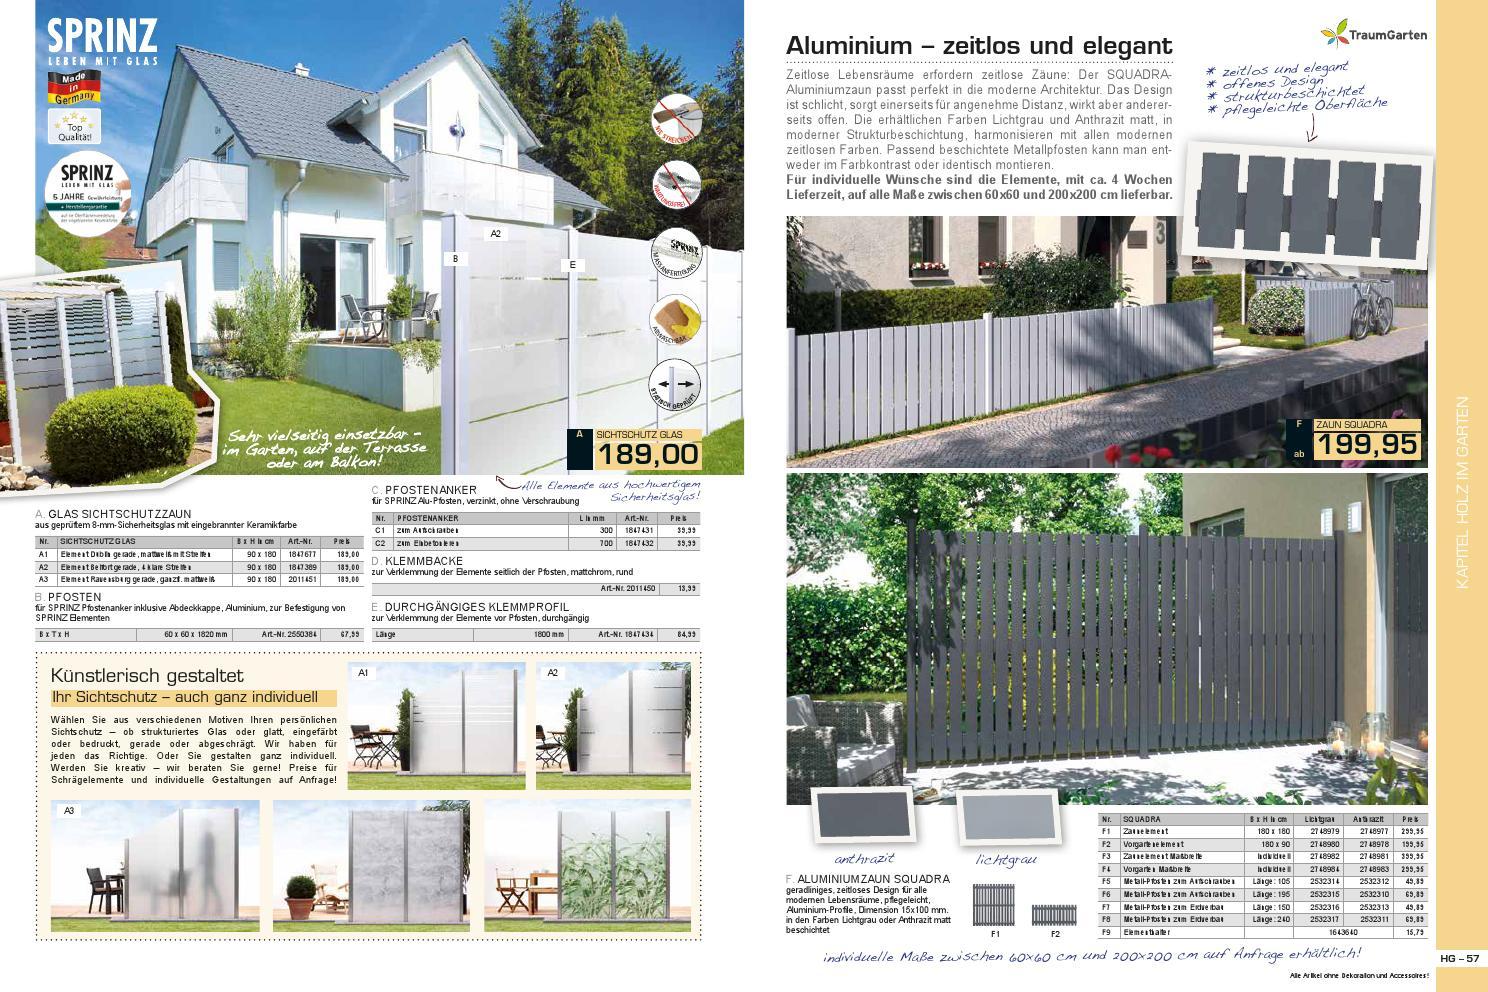 Gartenkatalog 2015 Bauzentrum Luchau By Fullhaus Issuu